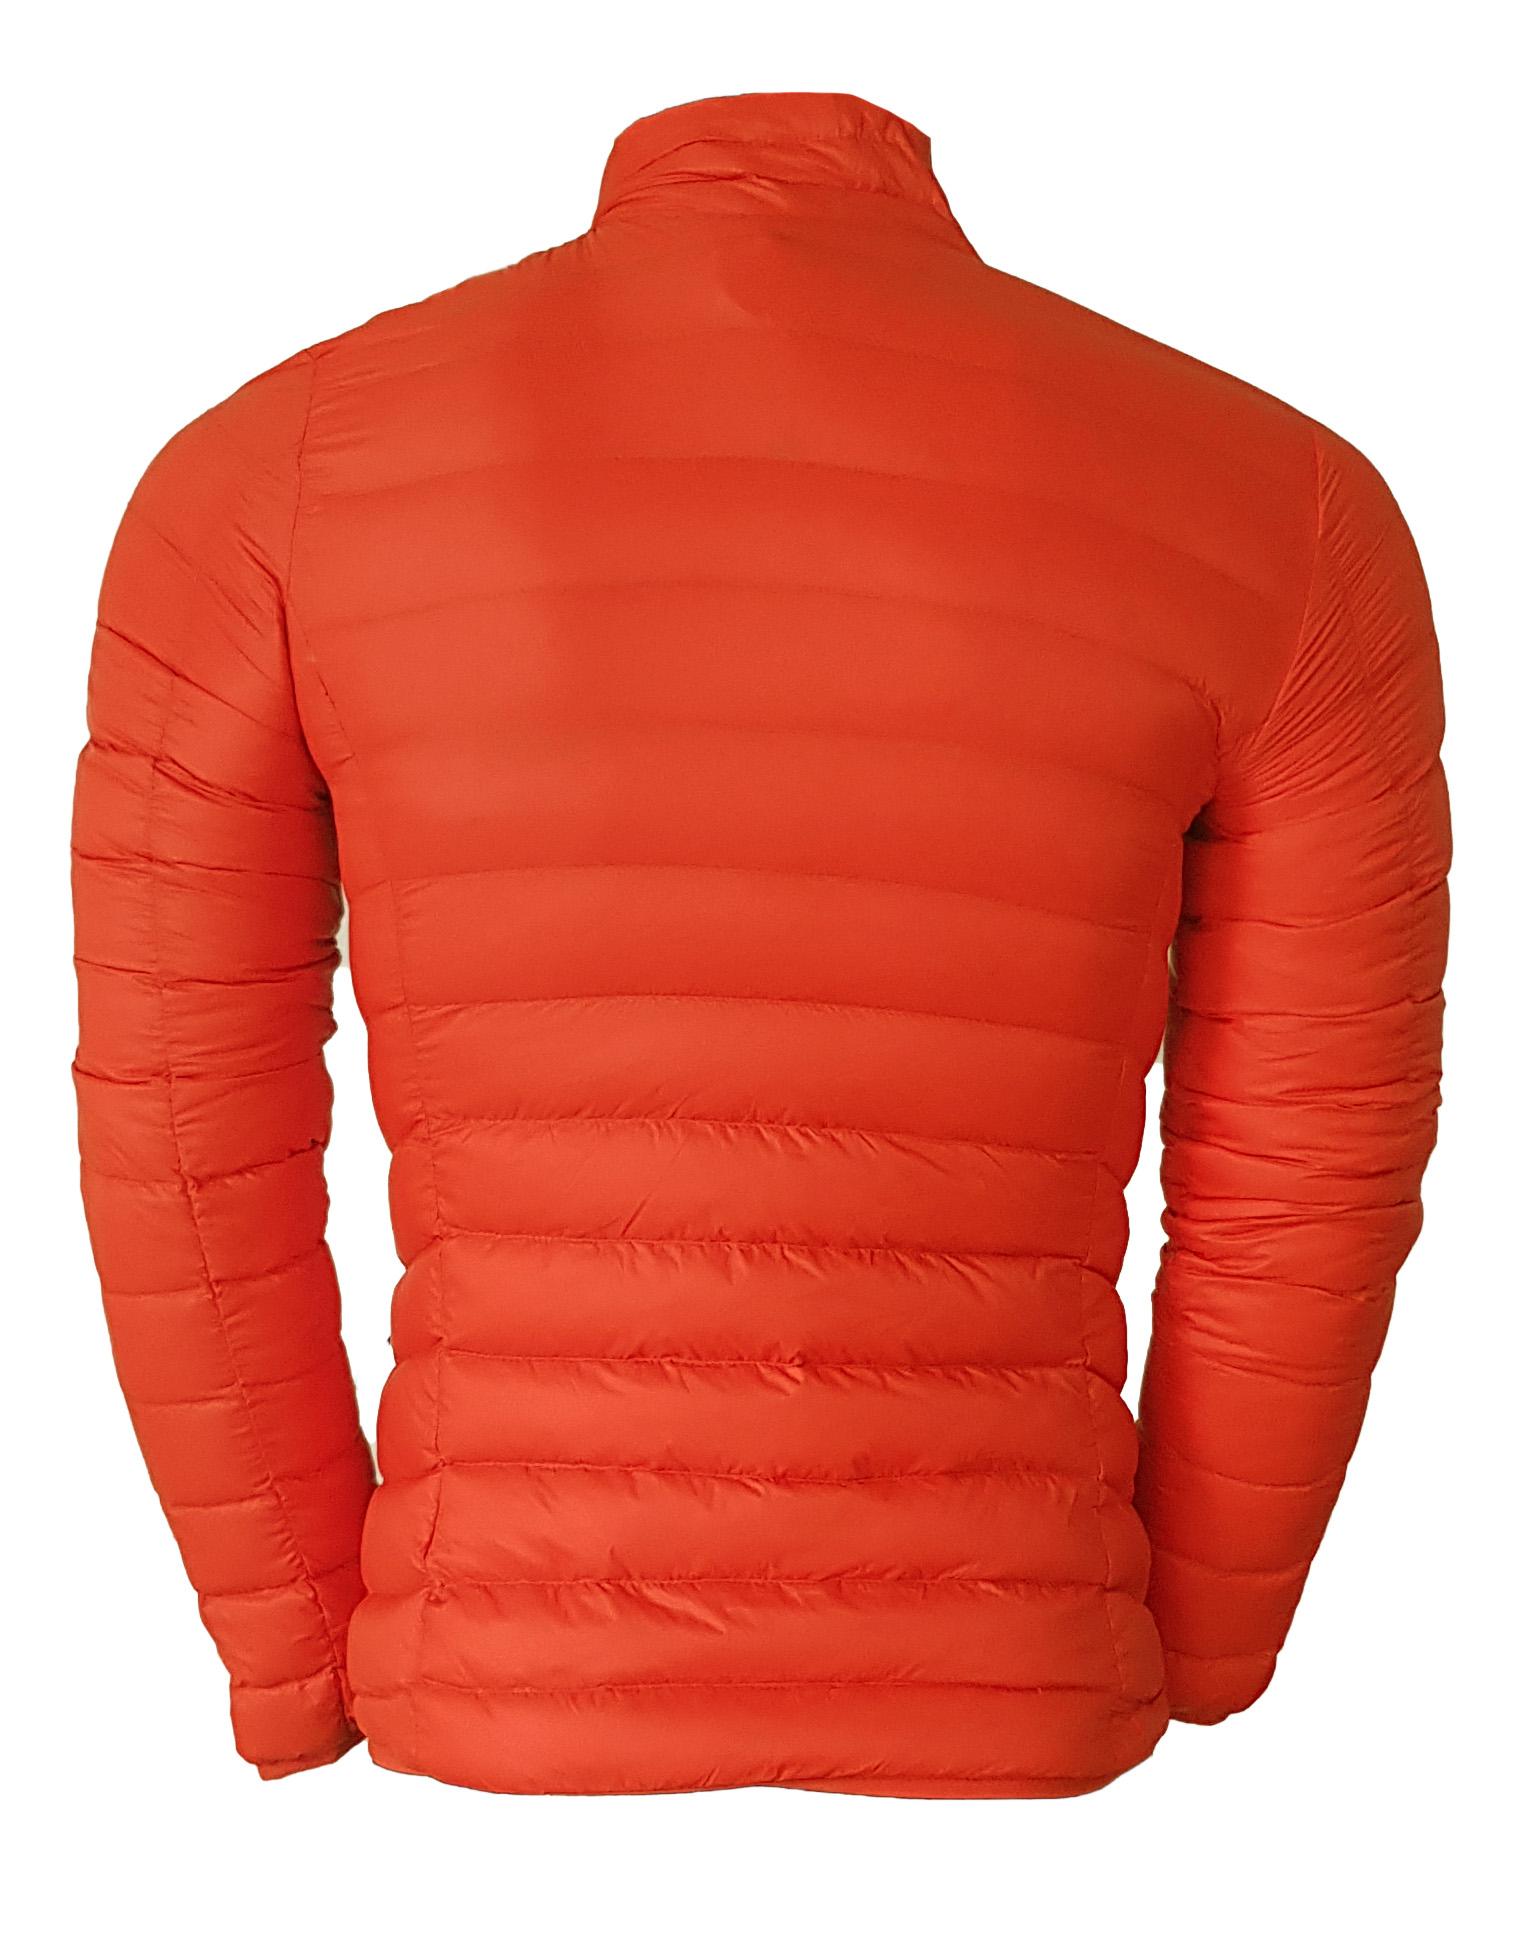 Nowa kurtka puchowa damska Grouse Creek Donald Orange